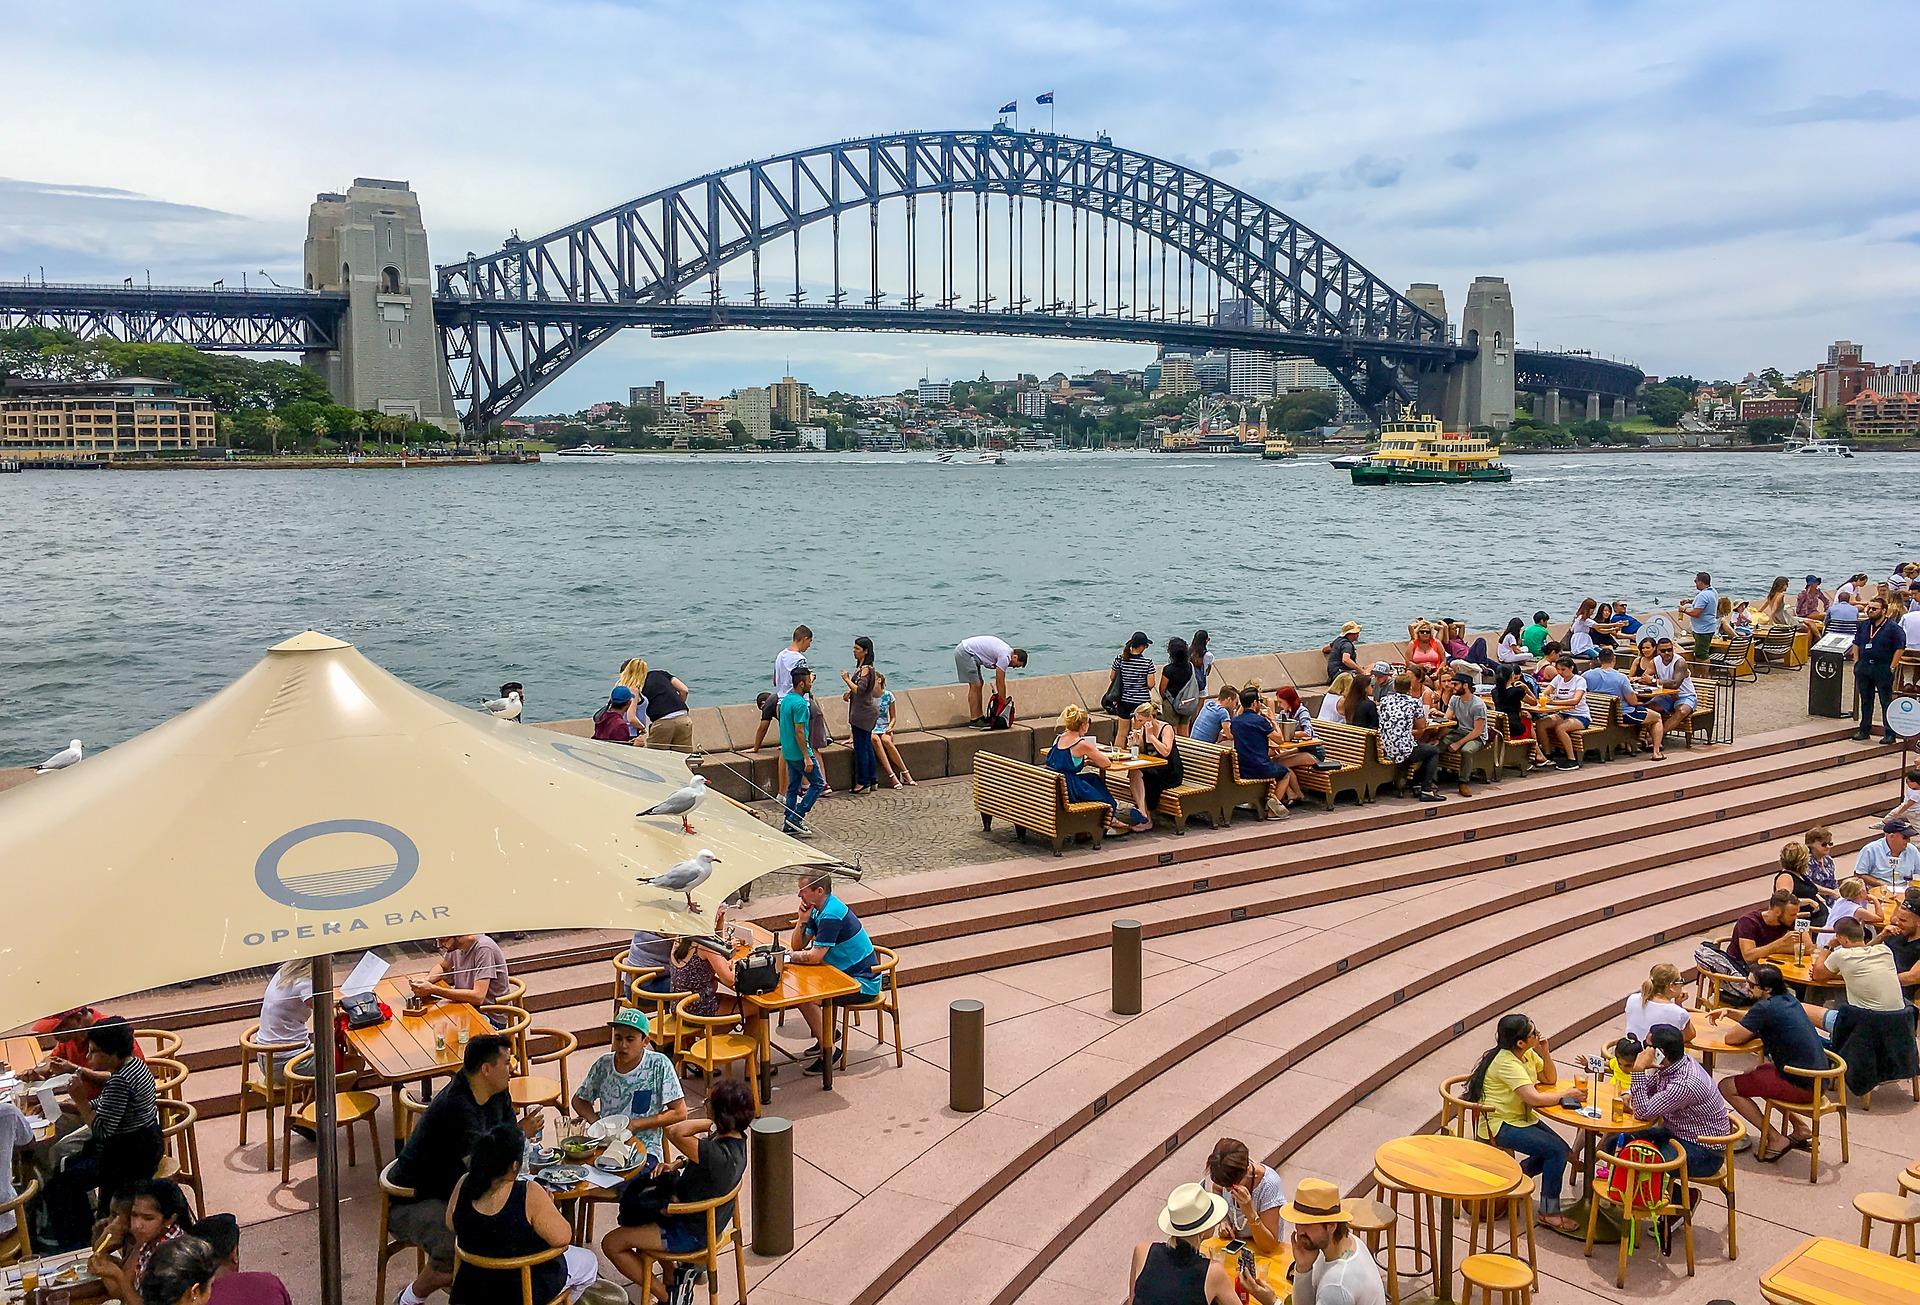 Do Australians share the same values?